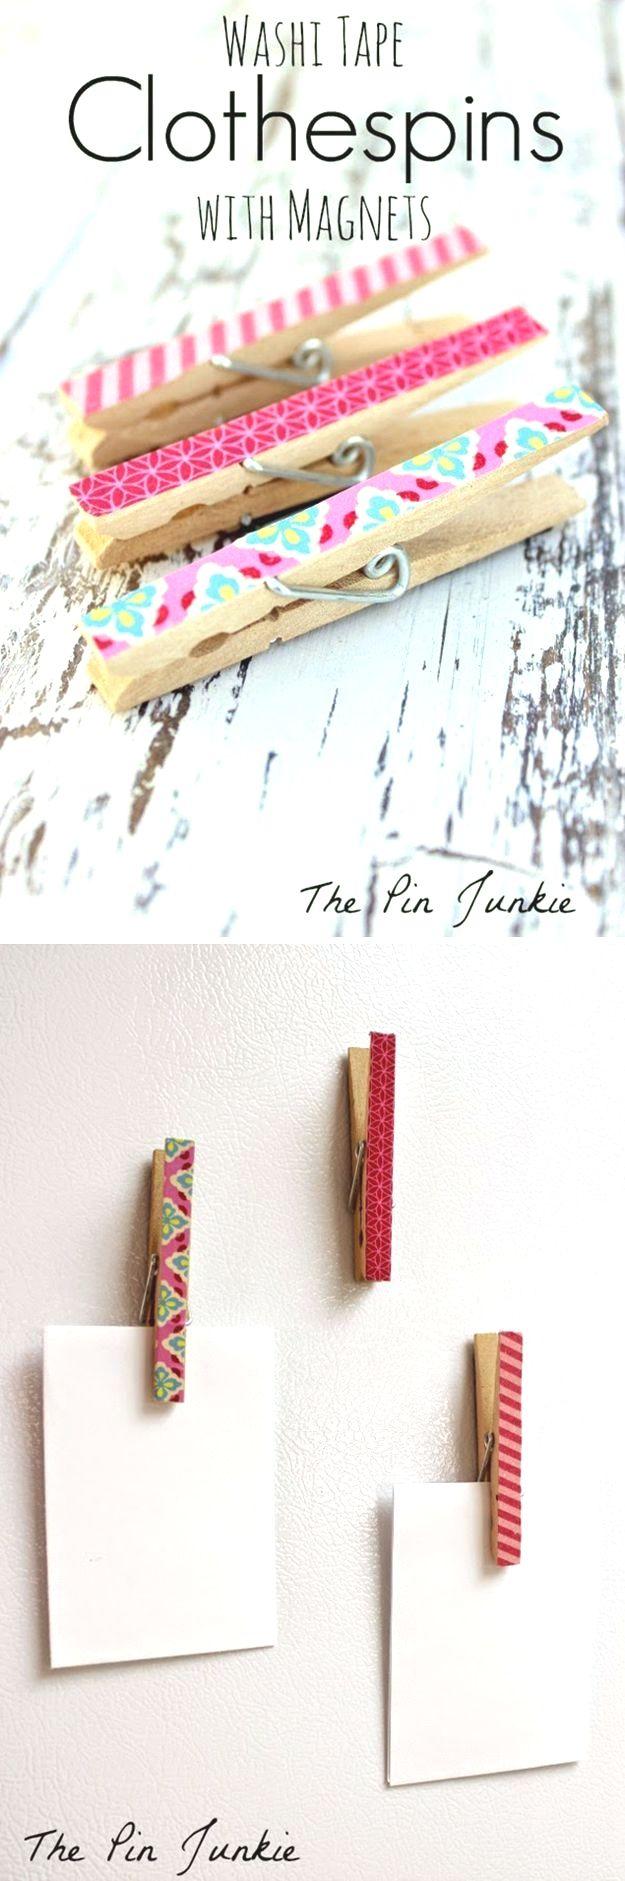 Pin by Larissa Henecke on DIY | Tape crafts, Easy diy crafts